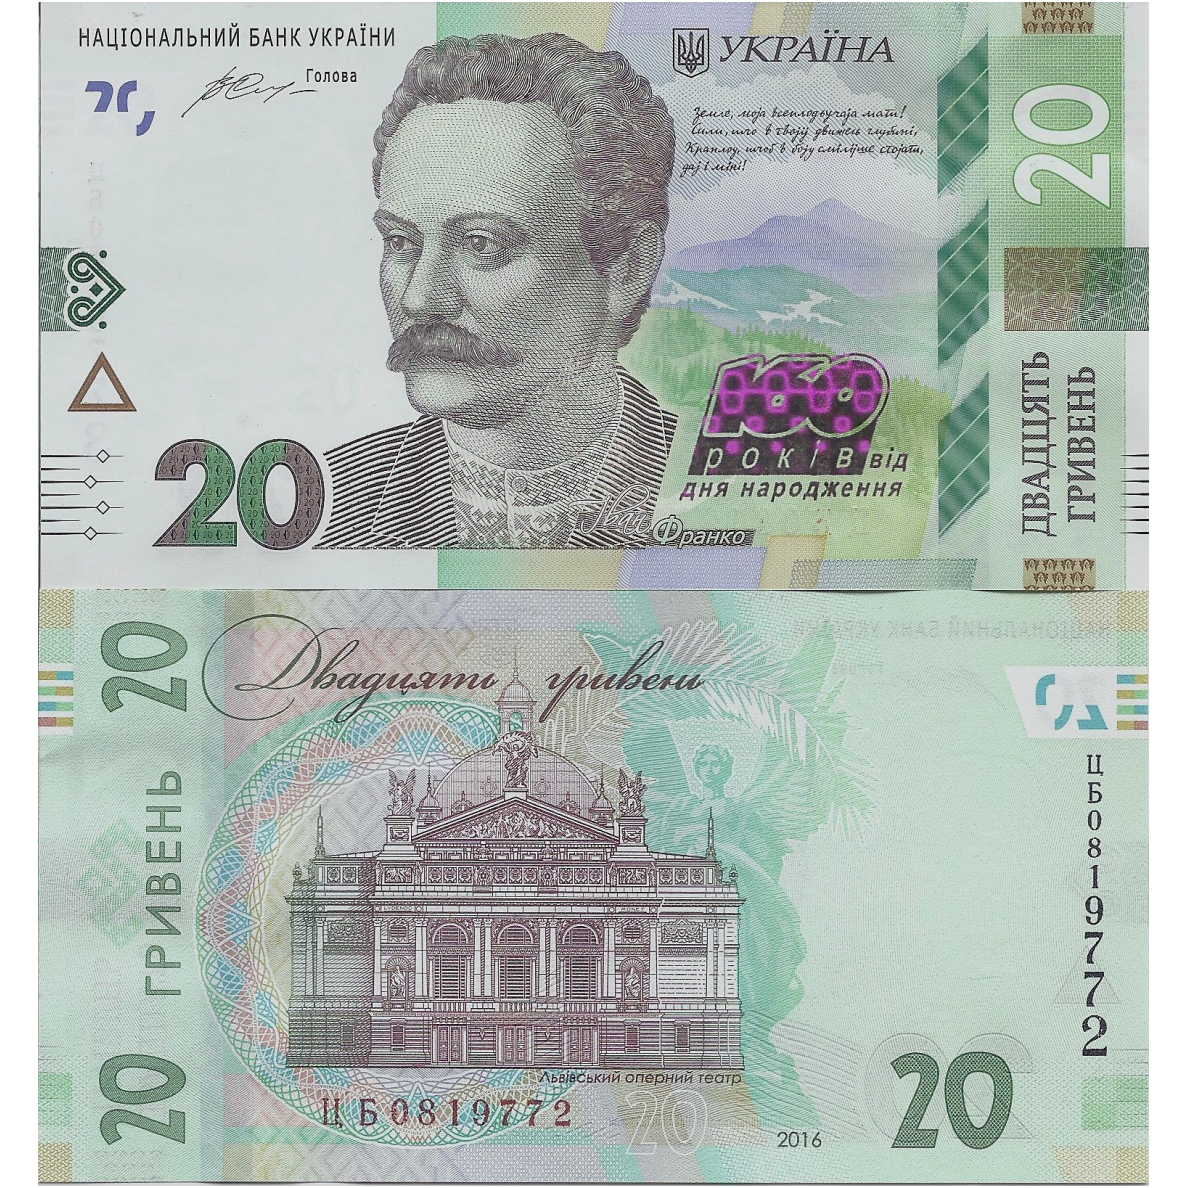 UKRAINE 200 HRYVEN 2019 P NEW SUPERB GEM UNC PMG 67 EPQ NEW LABEL